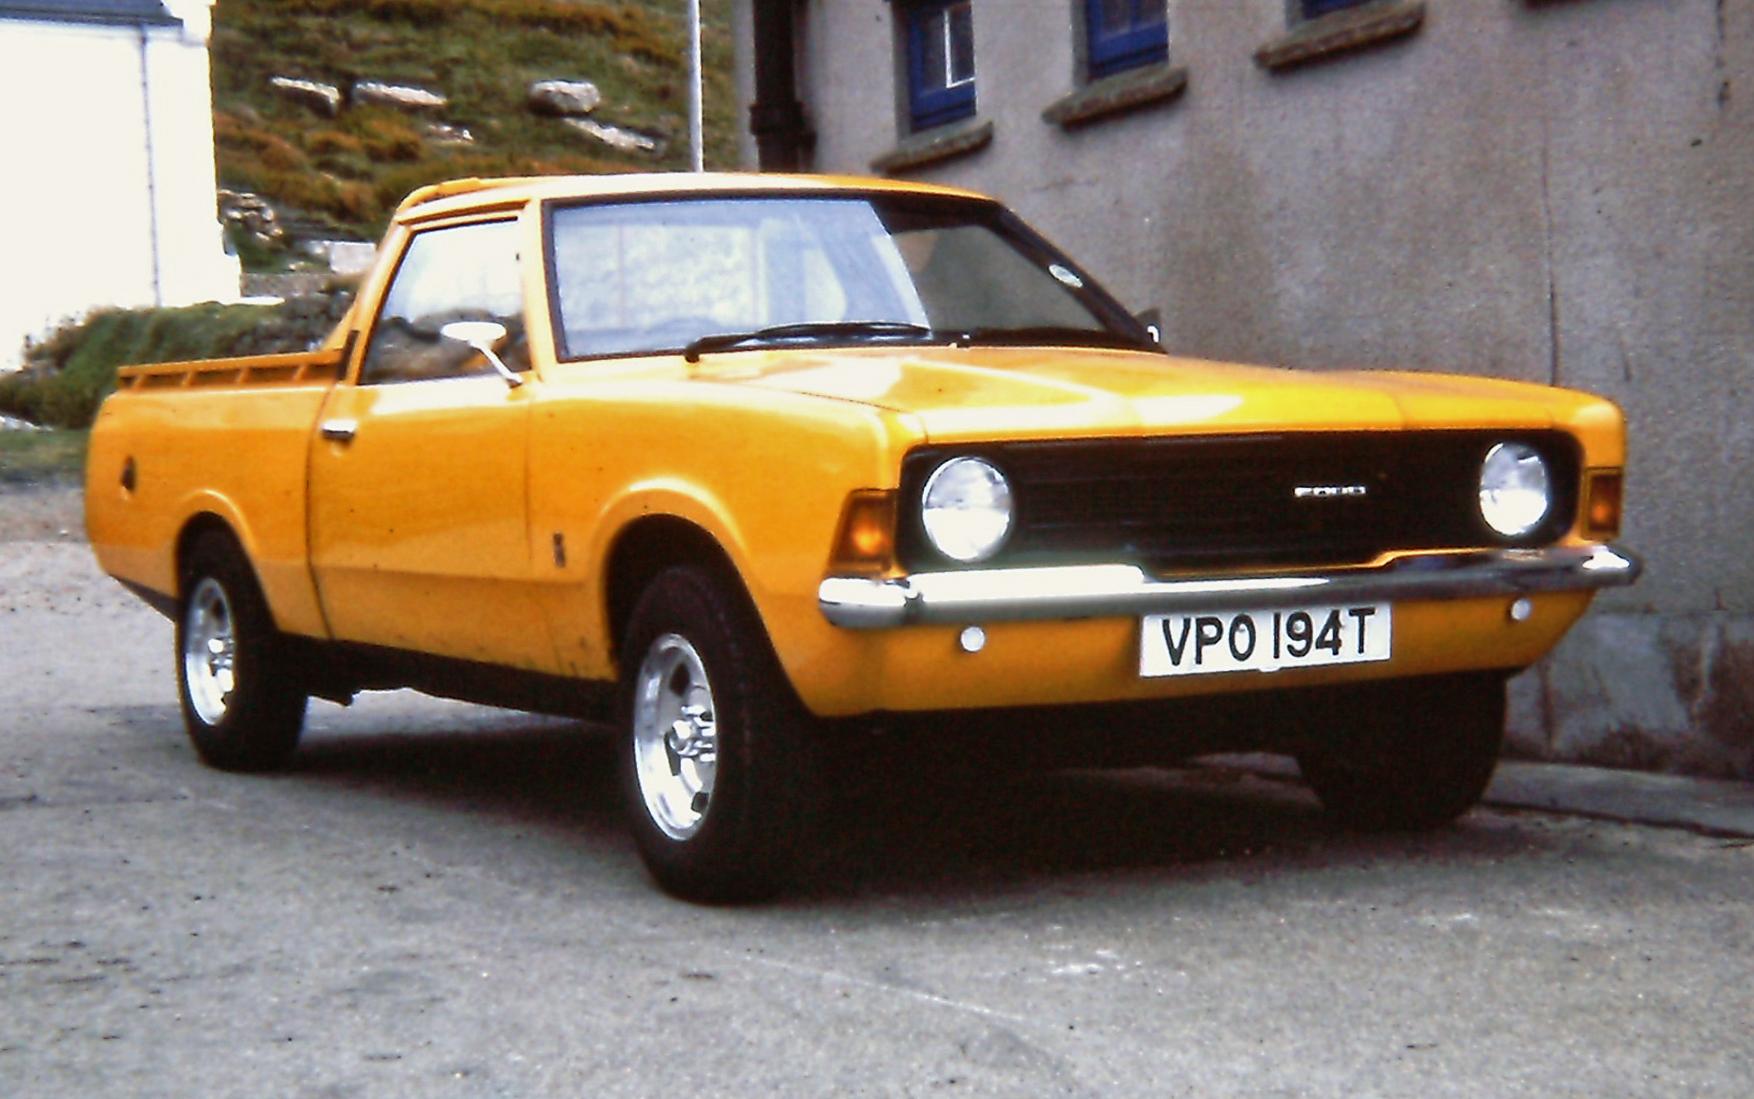 FileFord Cortina P100 Pick Up In UK Sep 1979